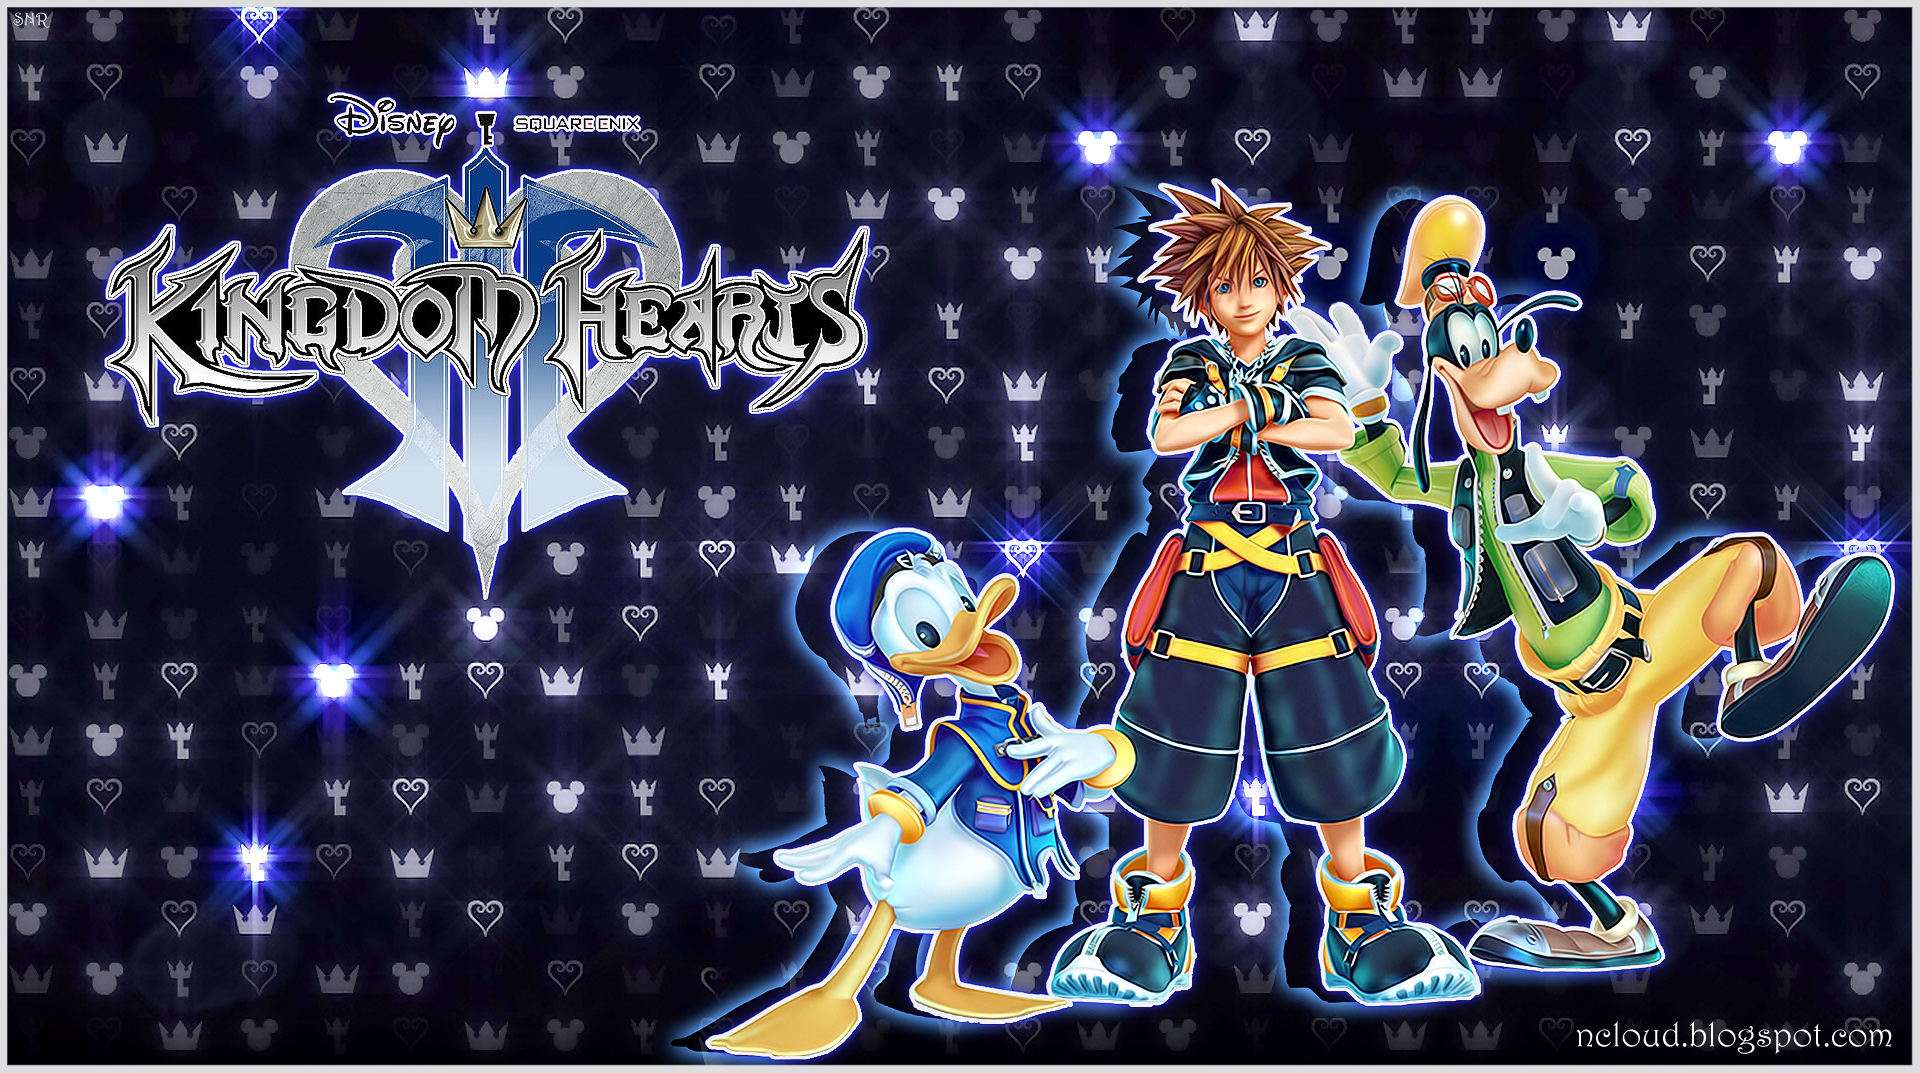 Games Movies Music Anime My Kingdom Hearts 3 Wallpaper 2 1920x1073